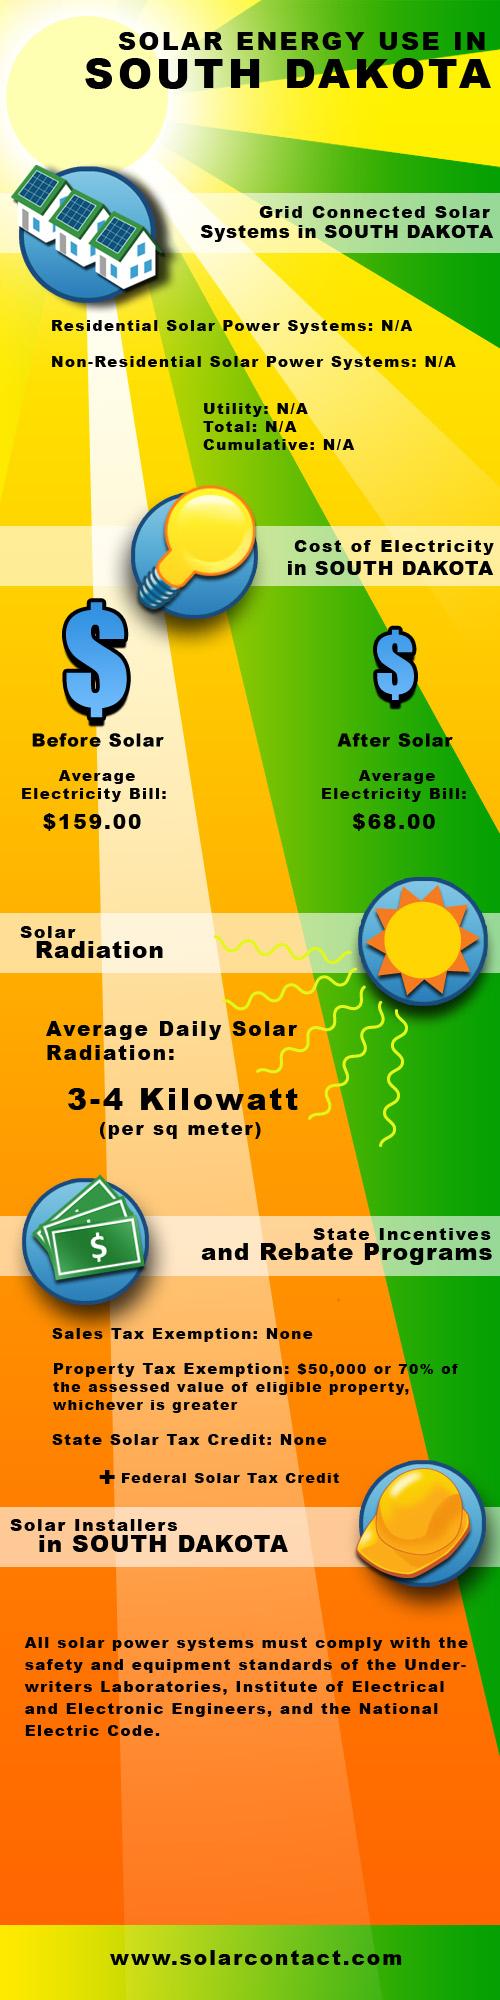 Fact Sheet Solar Energy Use in South Dakota